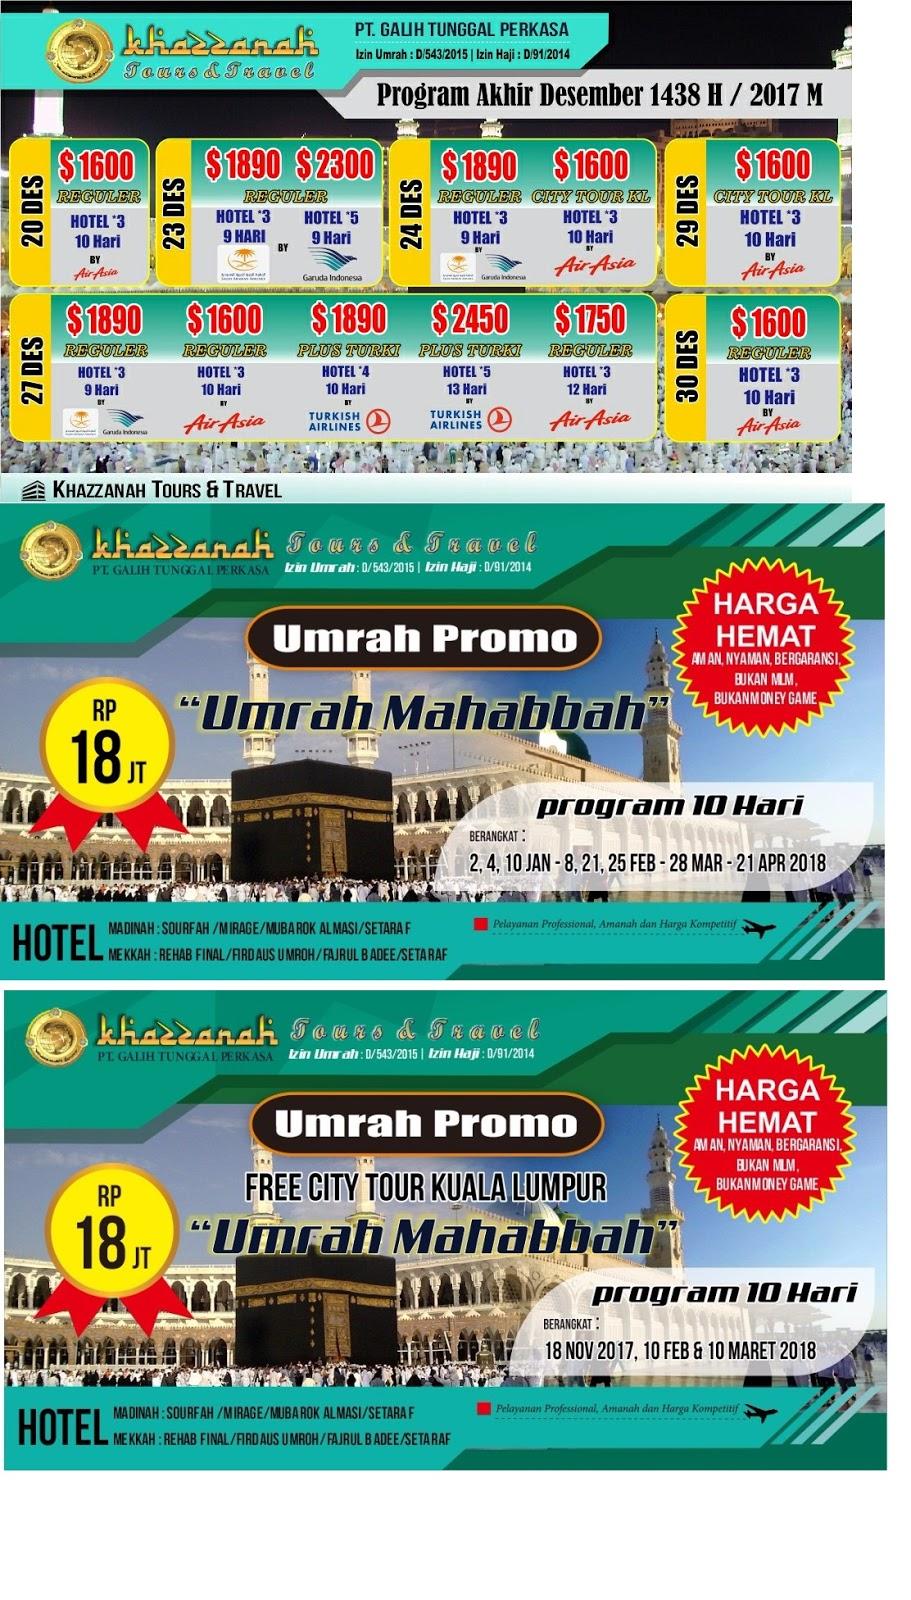 Paket Hajj Plus 2018 Khazzanah Tour